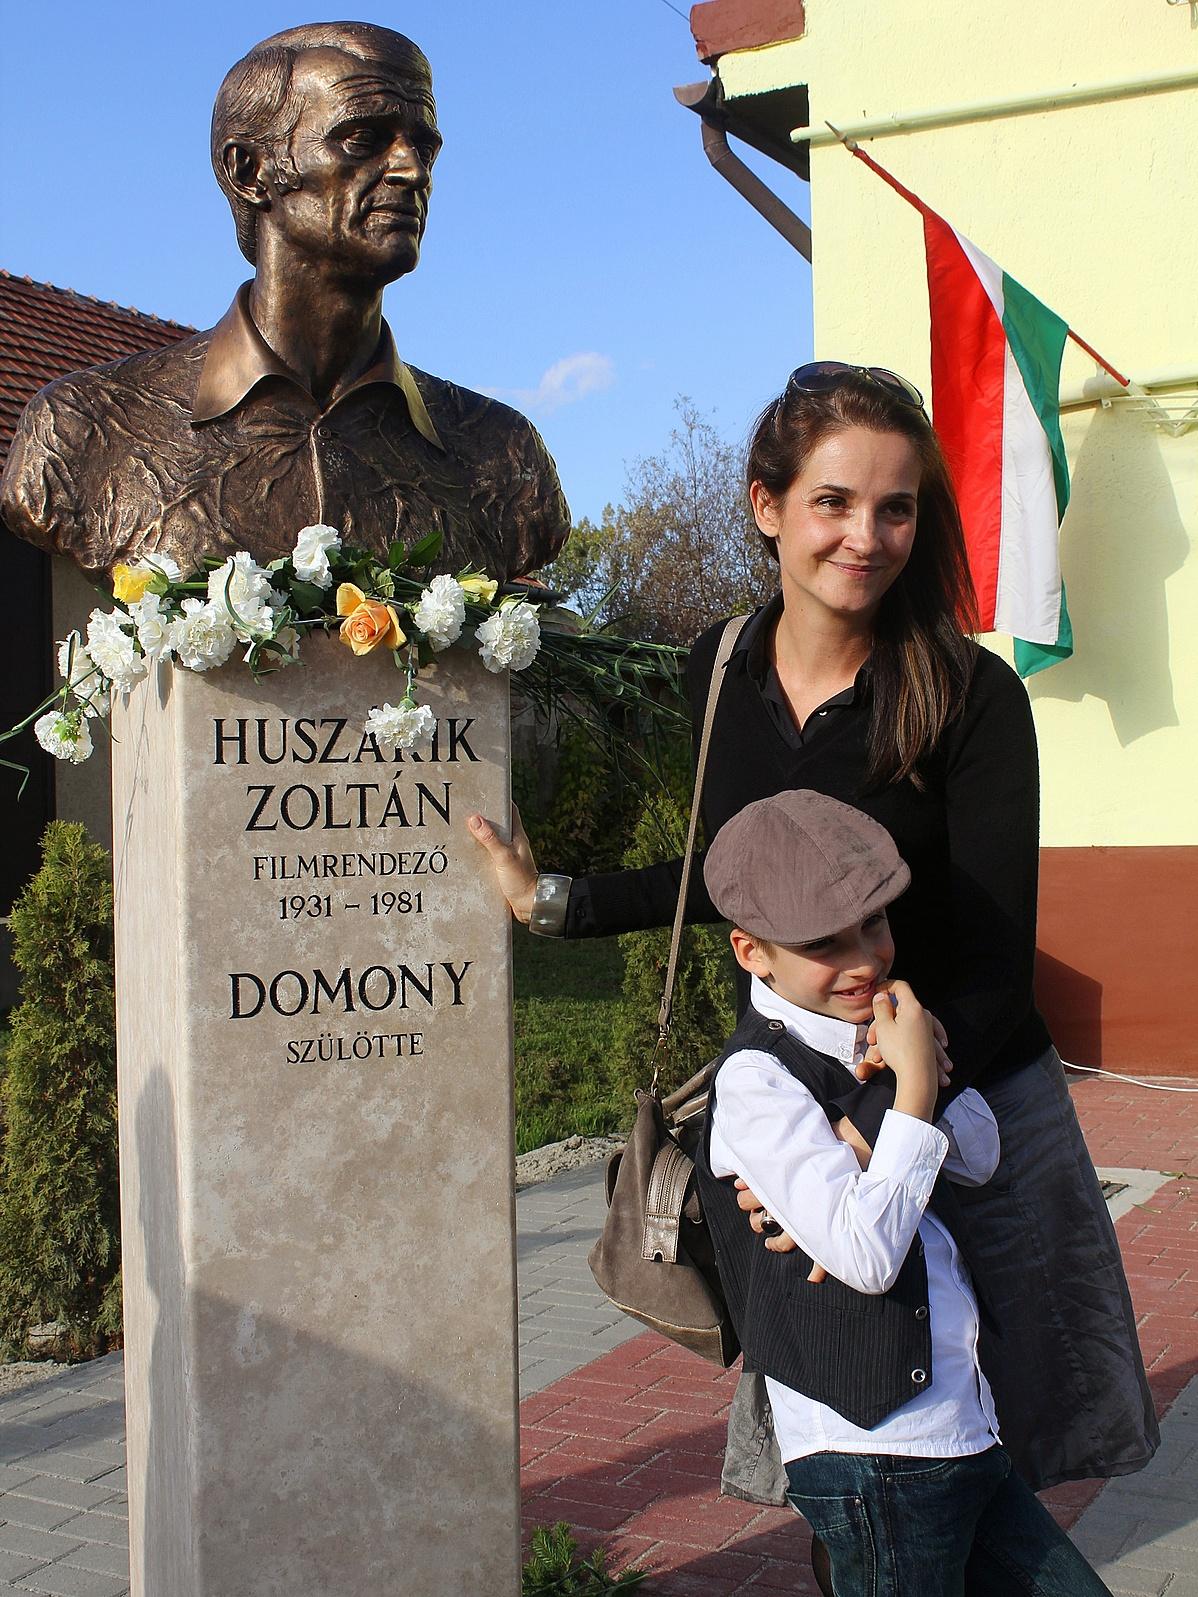 Kata_Huszarik_and_son_by_the_inauguration_of_bust_of_Zoltan_Huszarik-142745.jpg